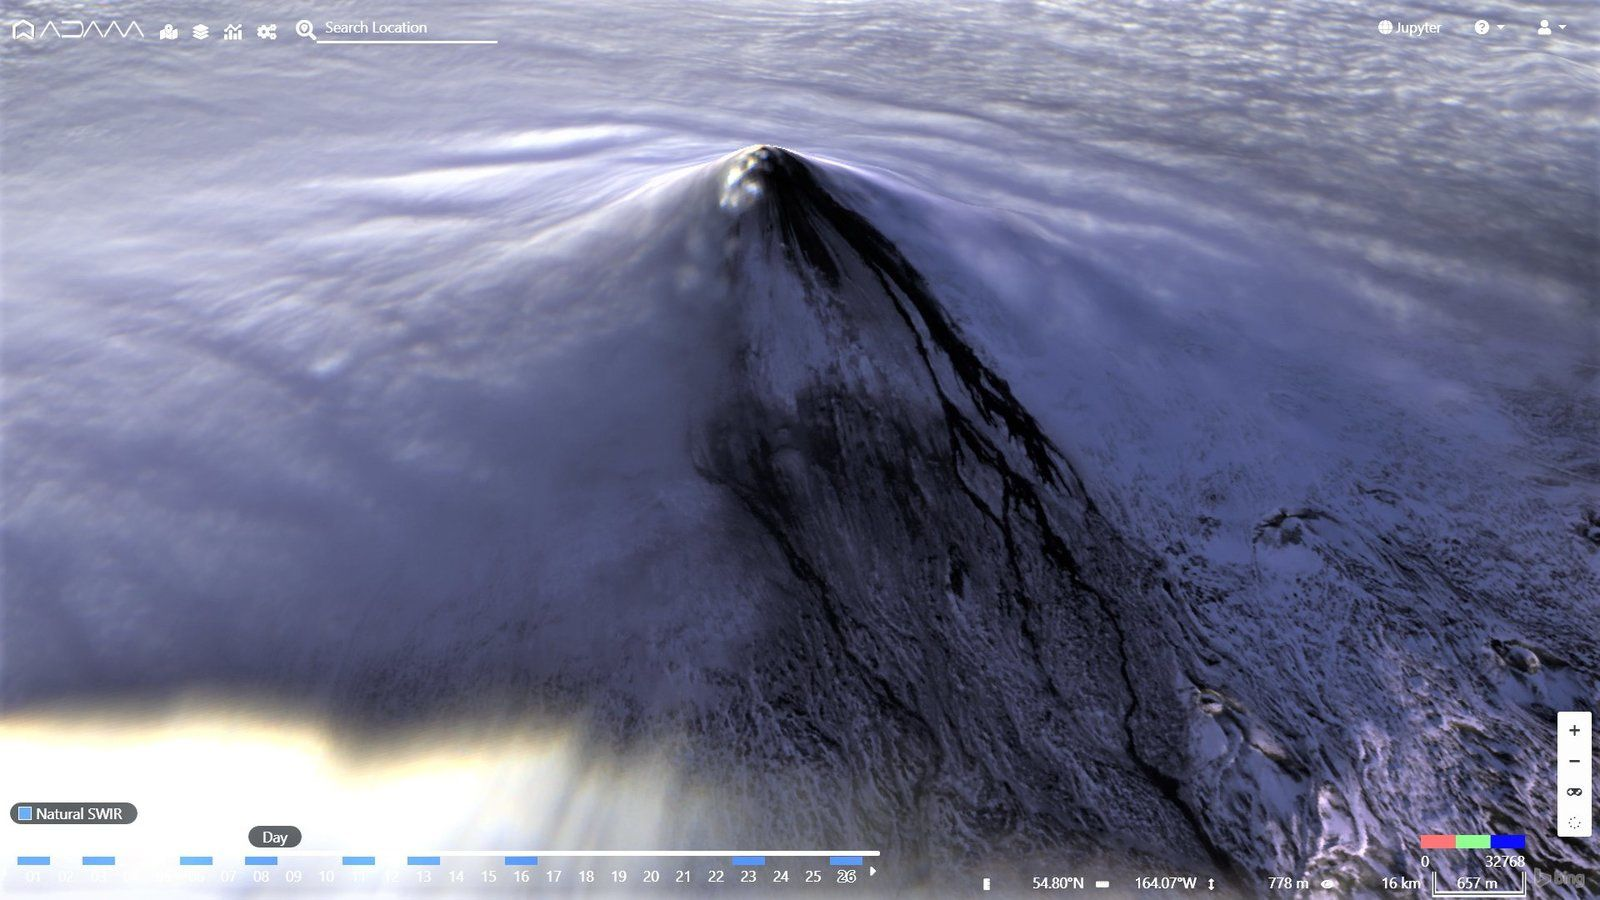 Shishaldin - image Sentinel-2 3D natur. Swir du 26.11.2019 - Copernicus